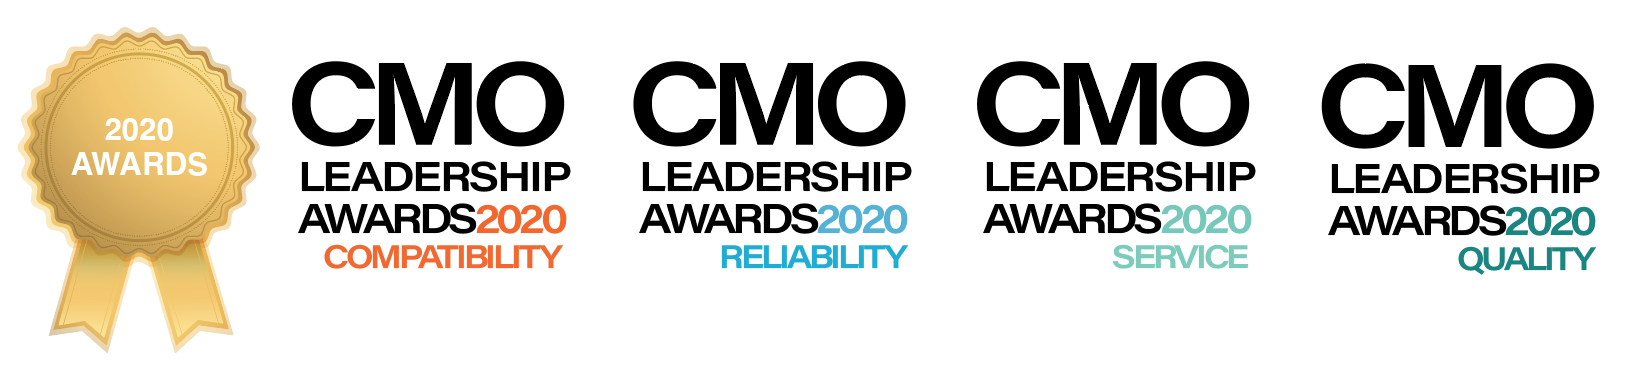 Pii CMO 2020 awards